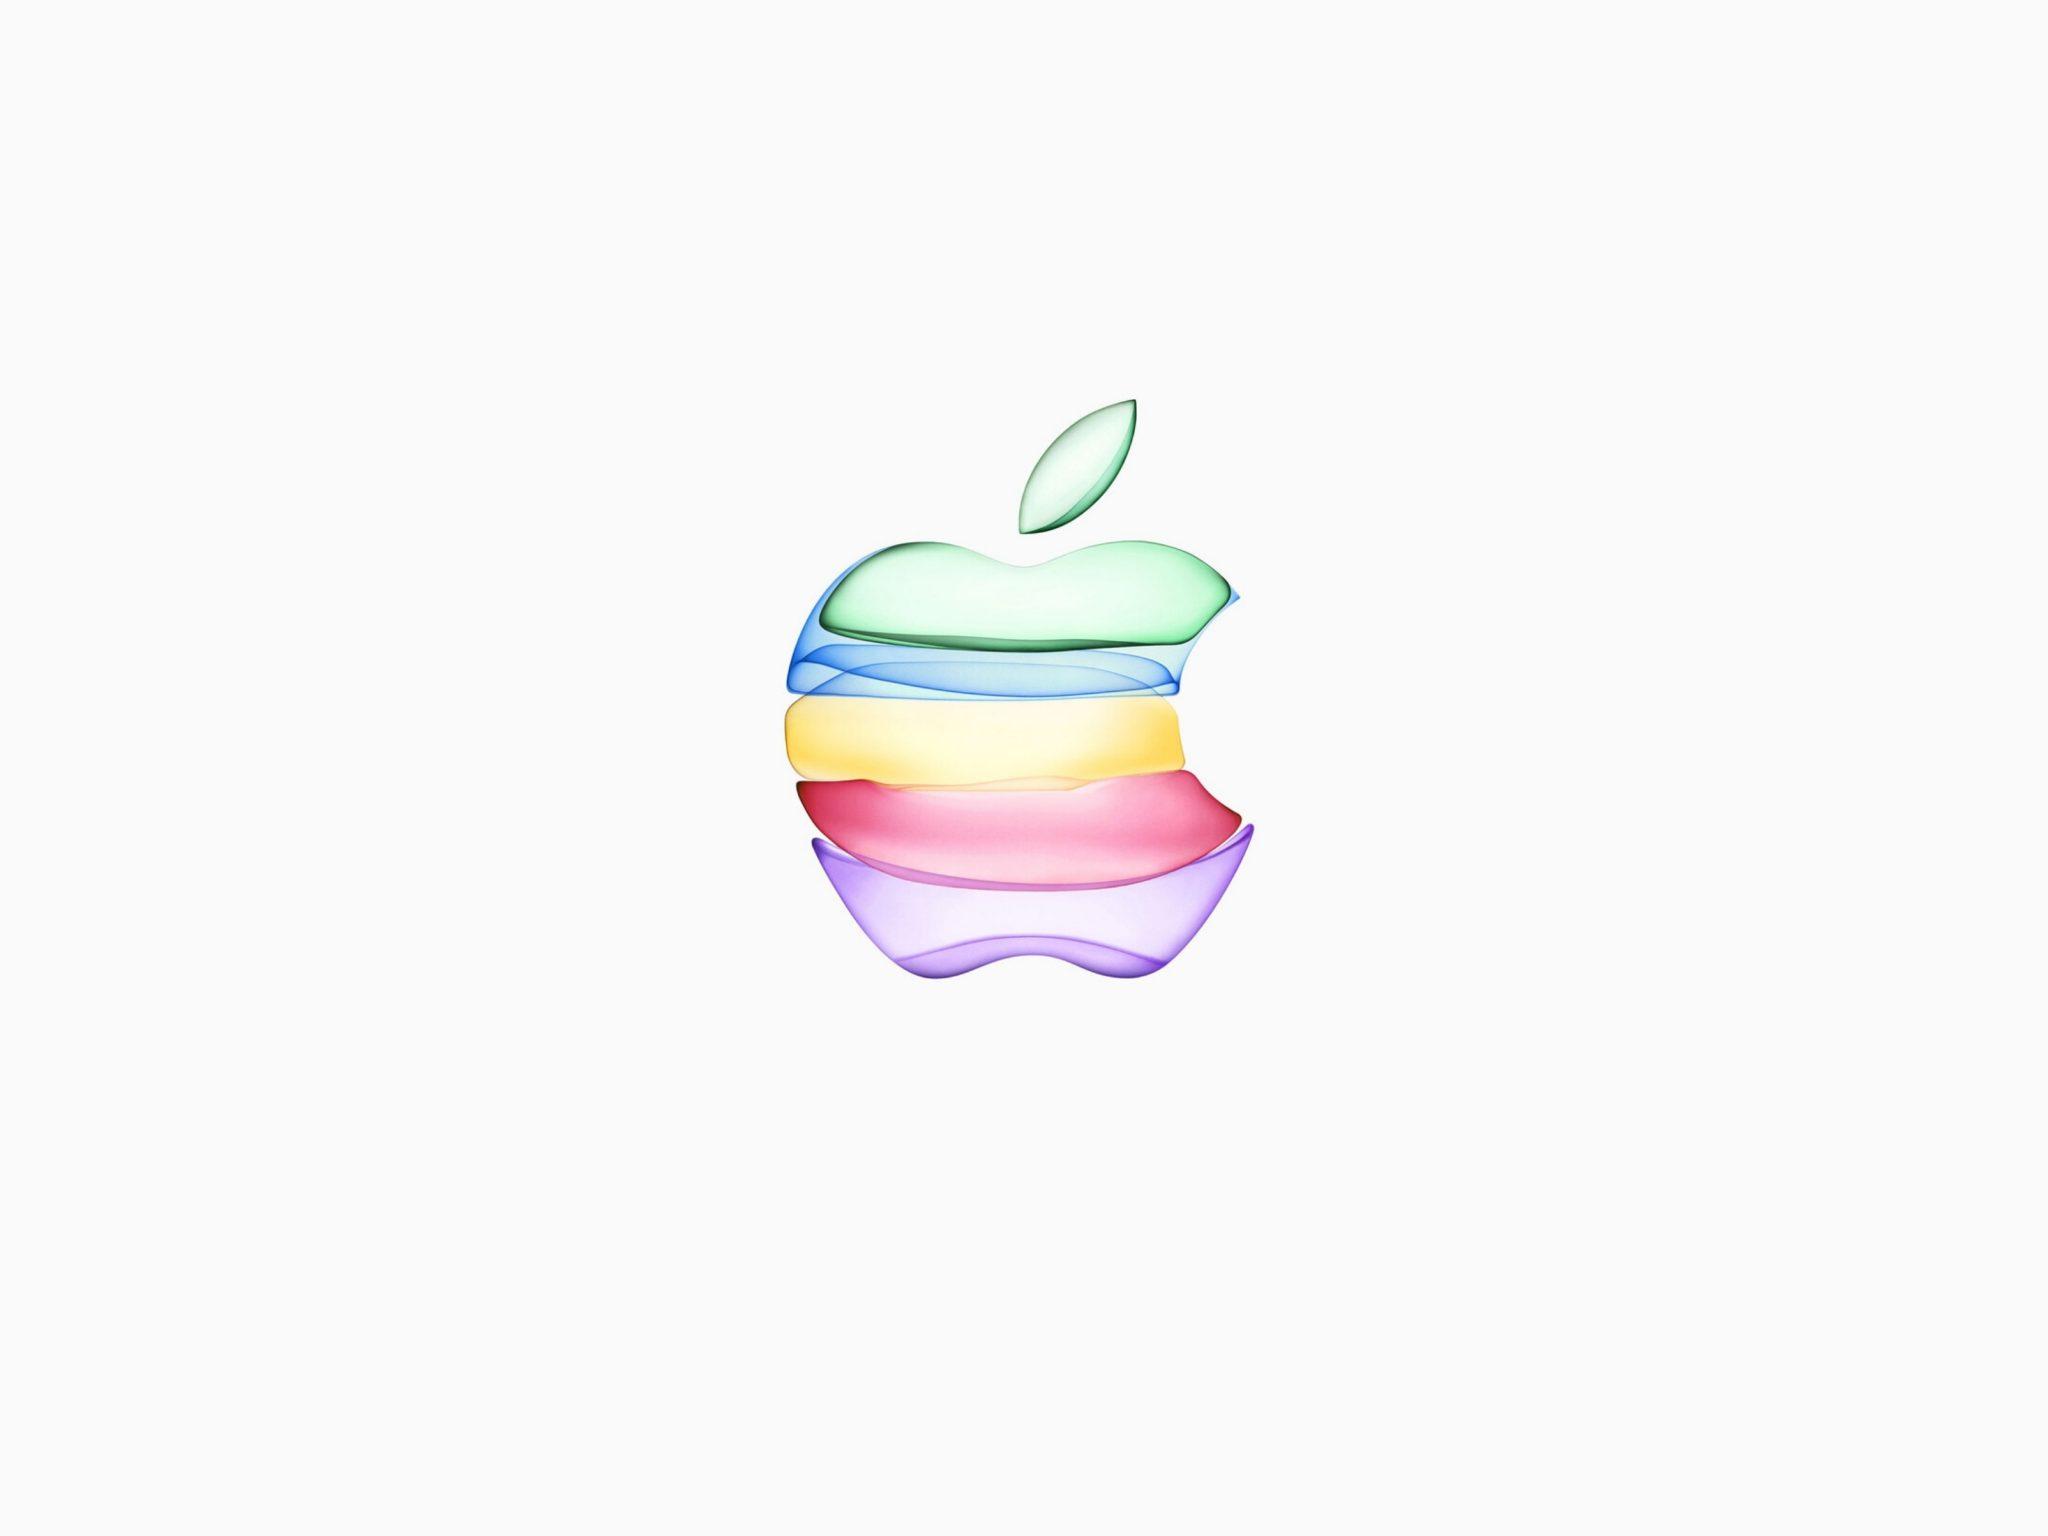 2048x1536 wallpaper iPhone 11 Apple Logo White Background iPad Wallpaper 2048x1536 pixels resolution